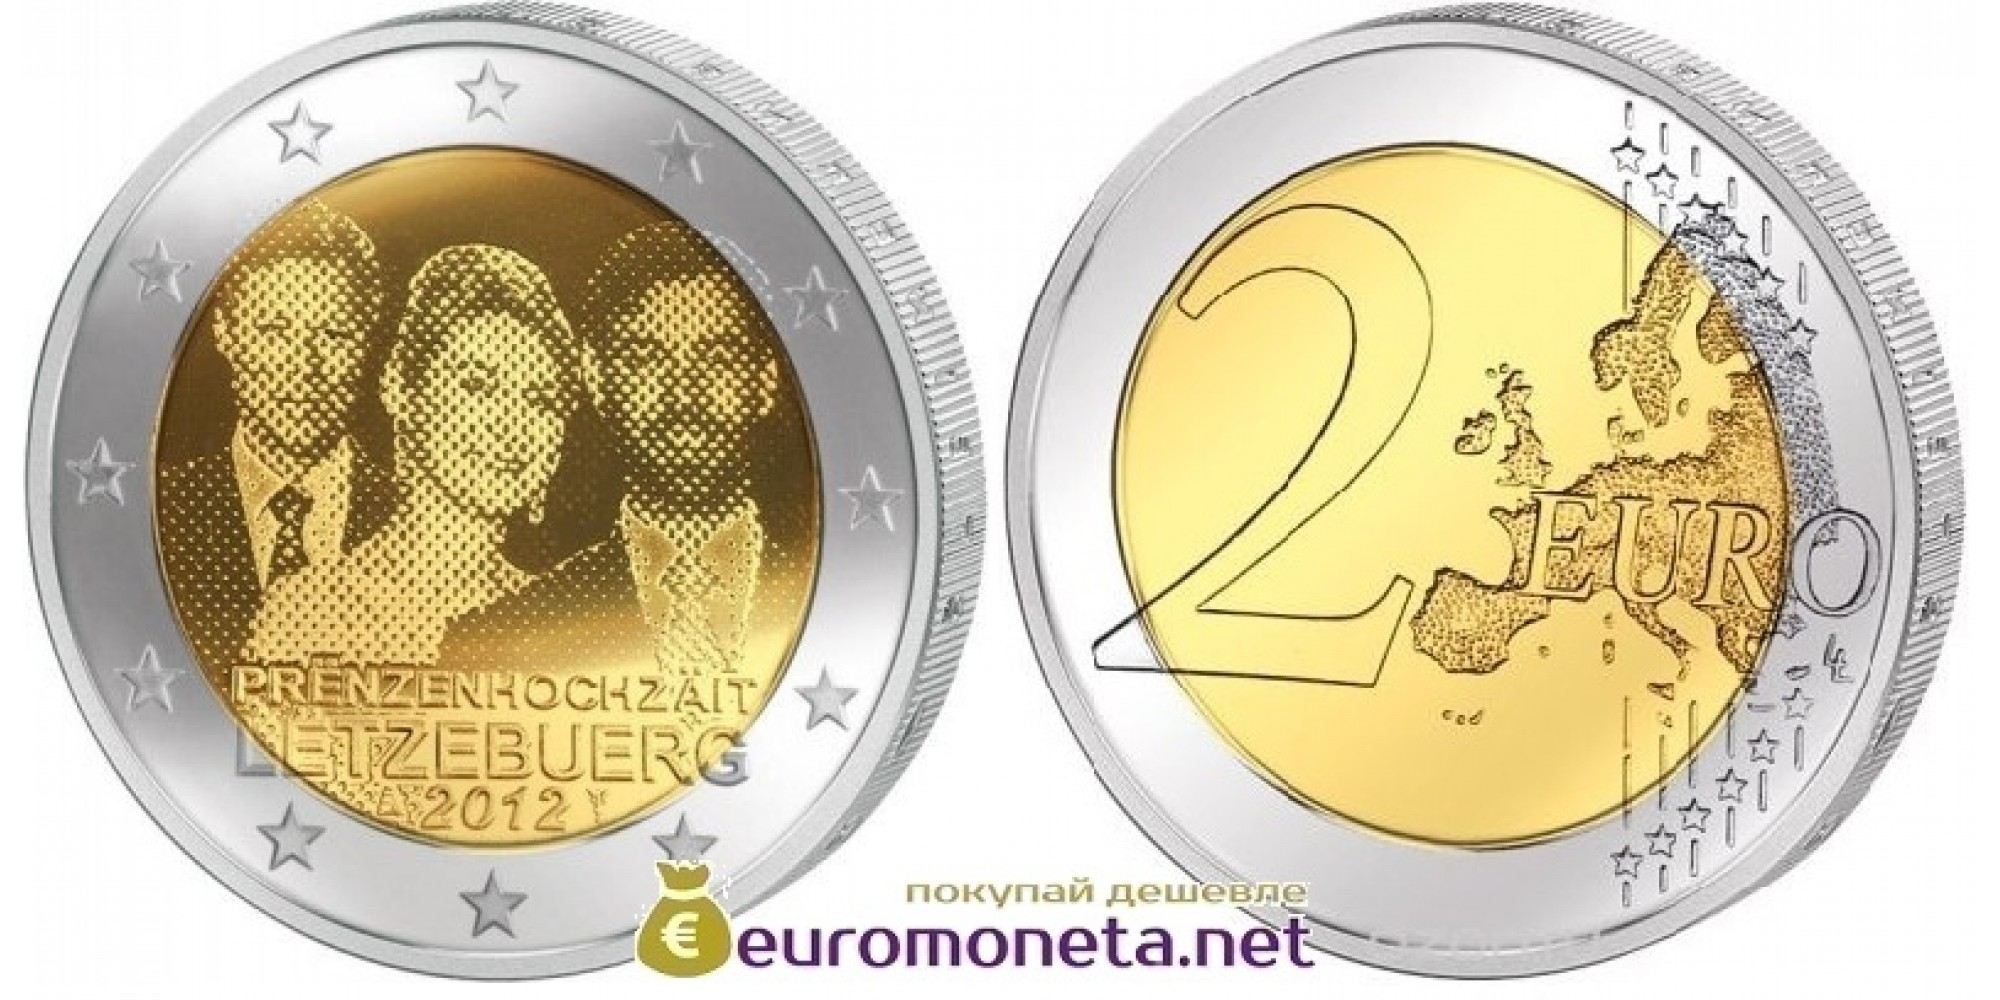 Люксембург 2 евро 2012 год Свадьба, биметалл АЦ из ролла